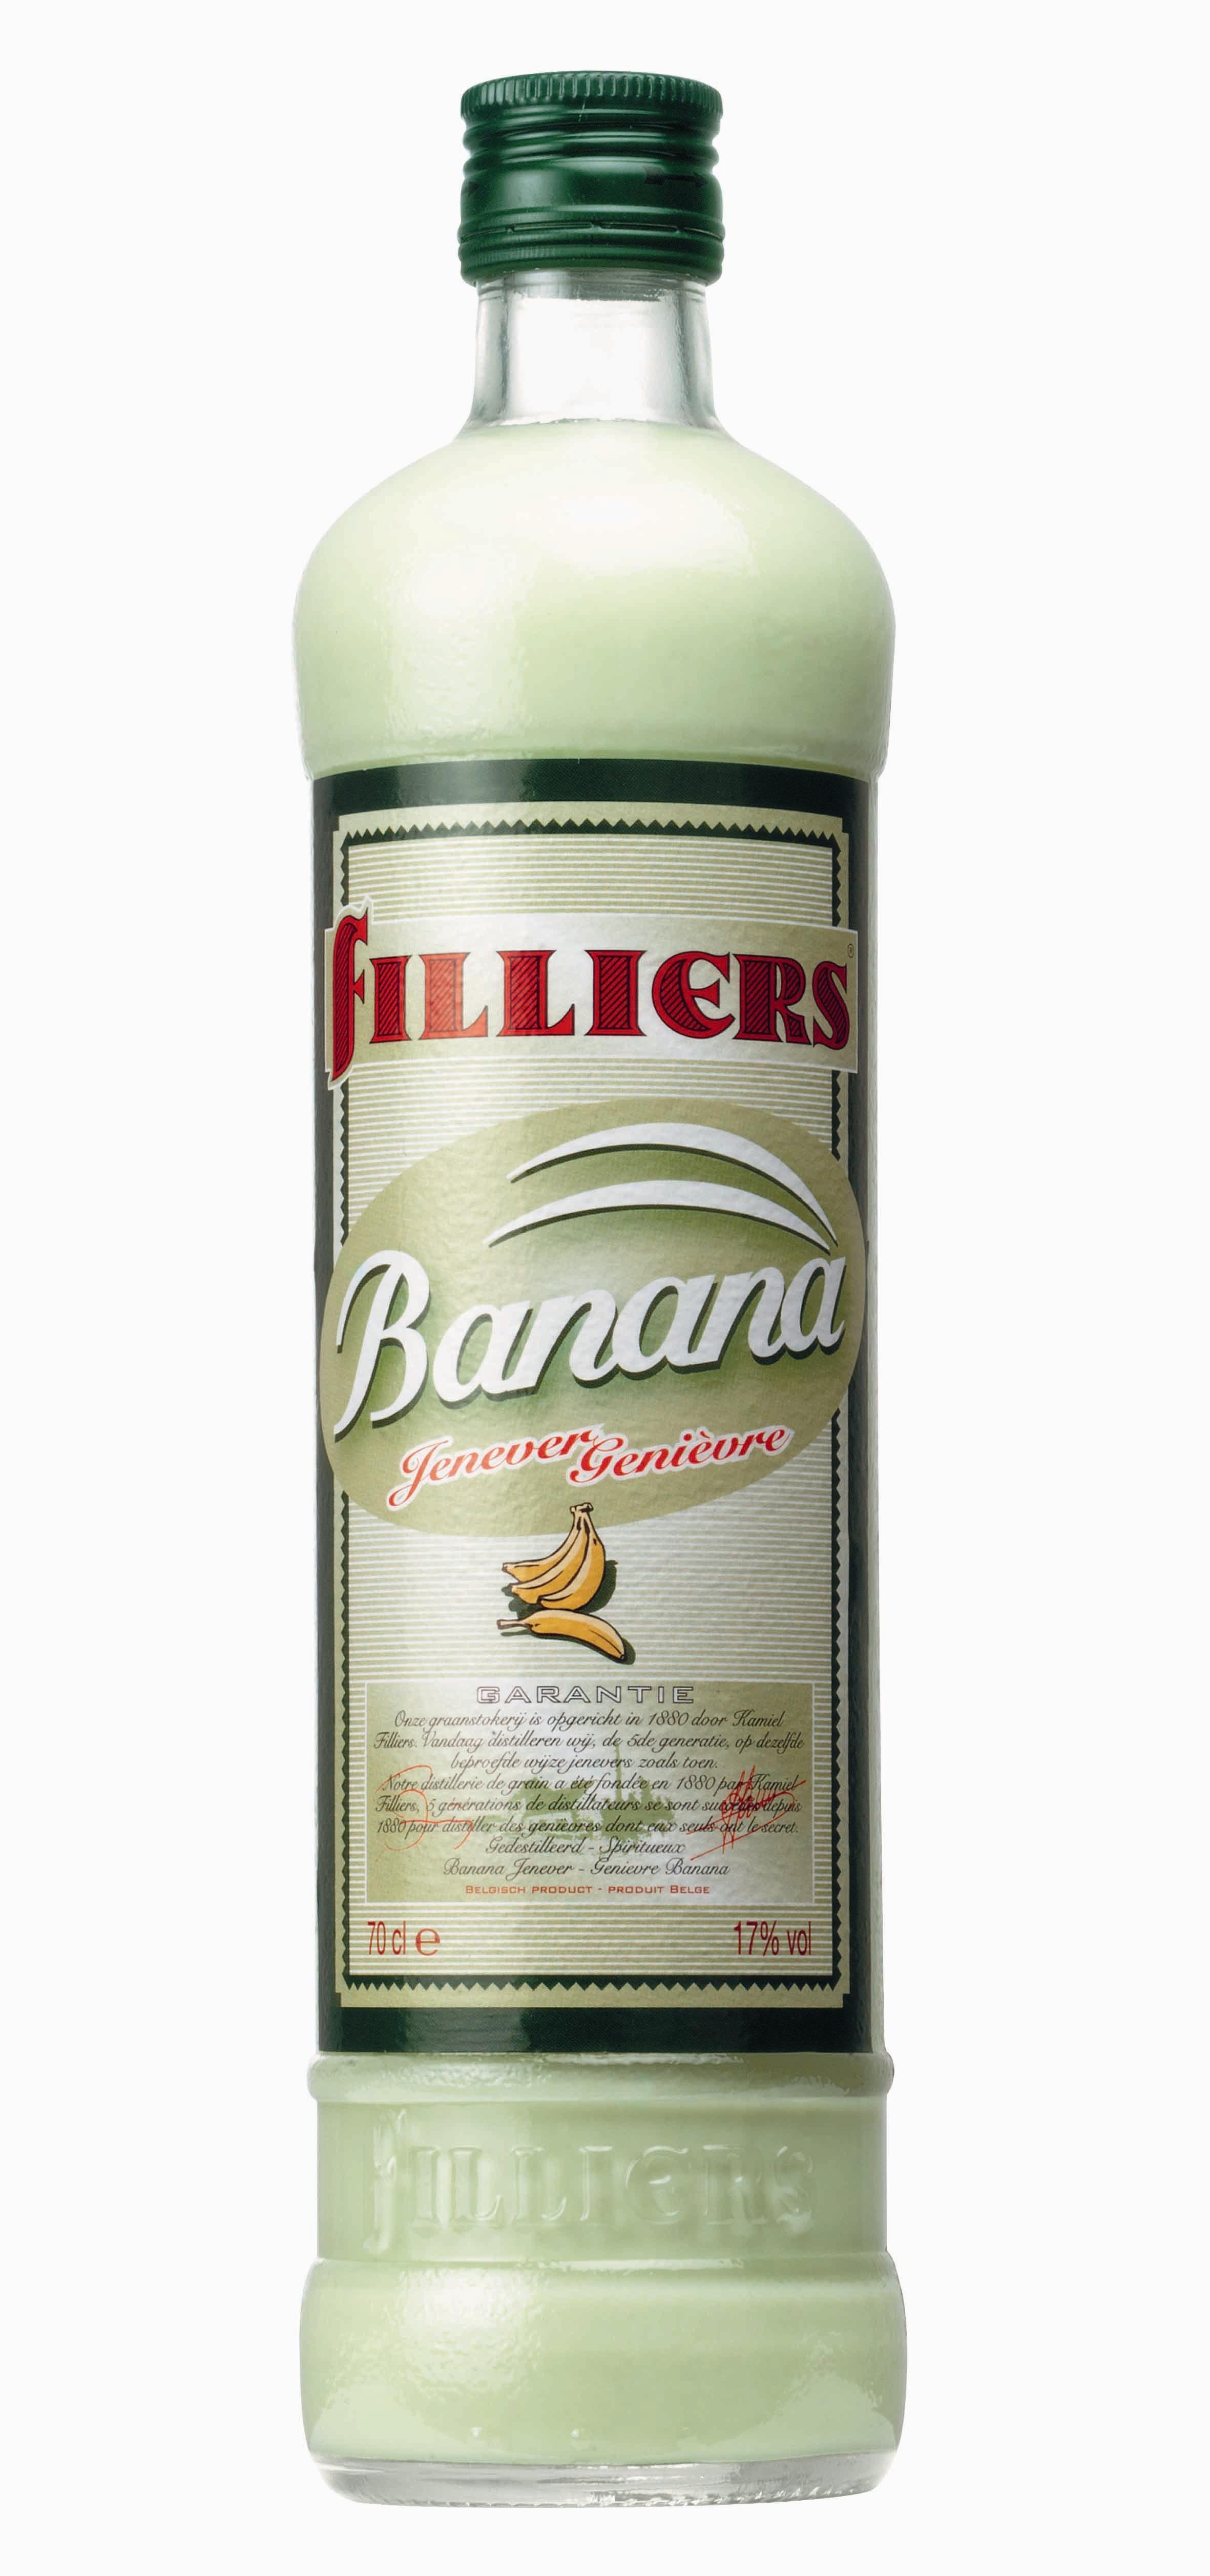 Filliers banana cream jenever 70cl 17%